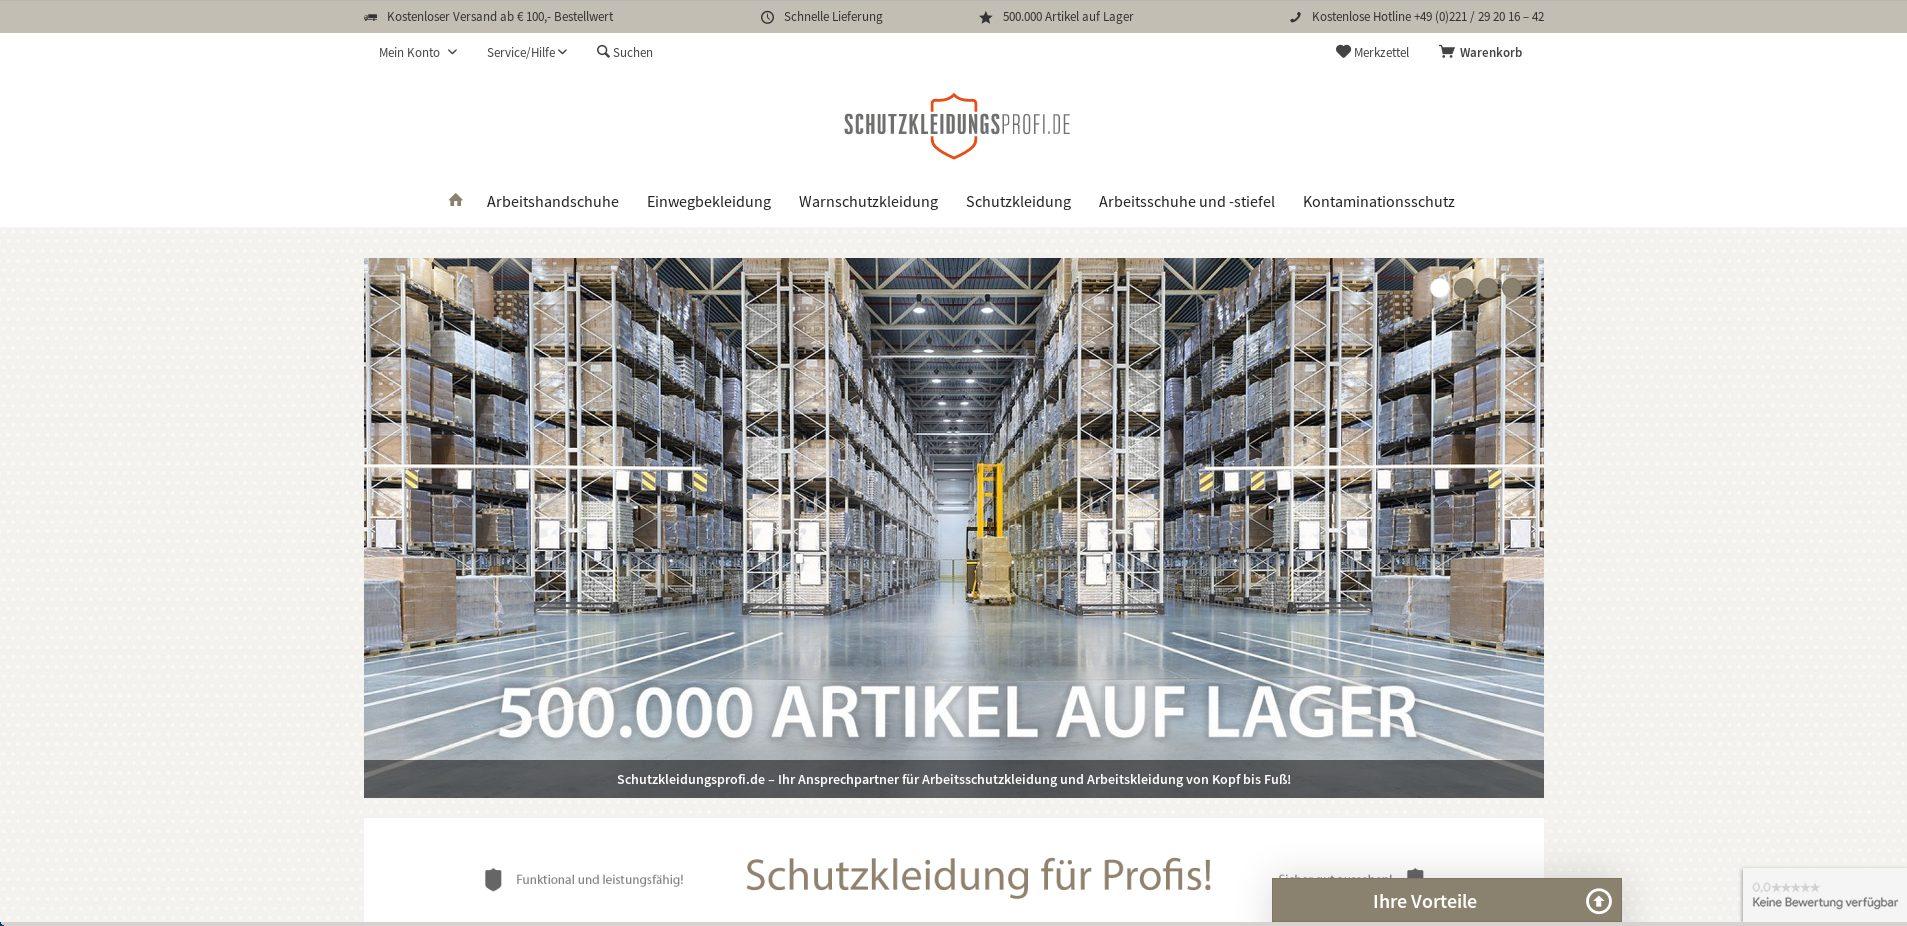 schutzkleidungsprofi.de